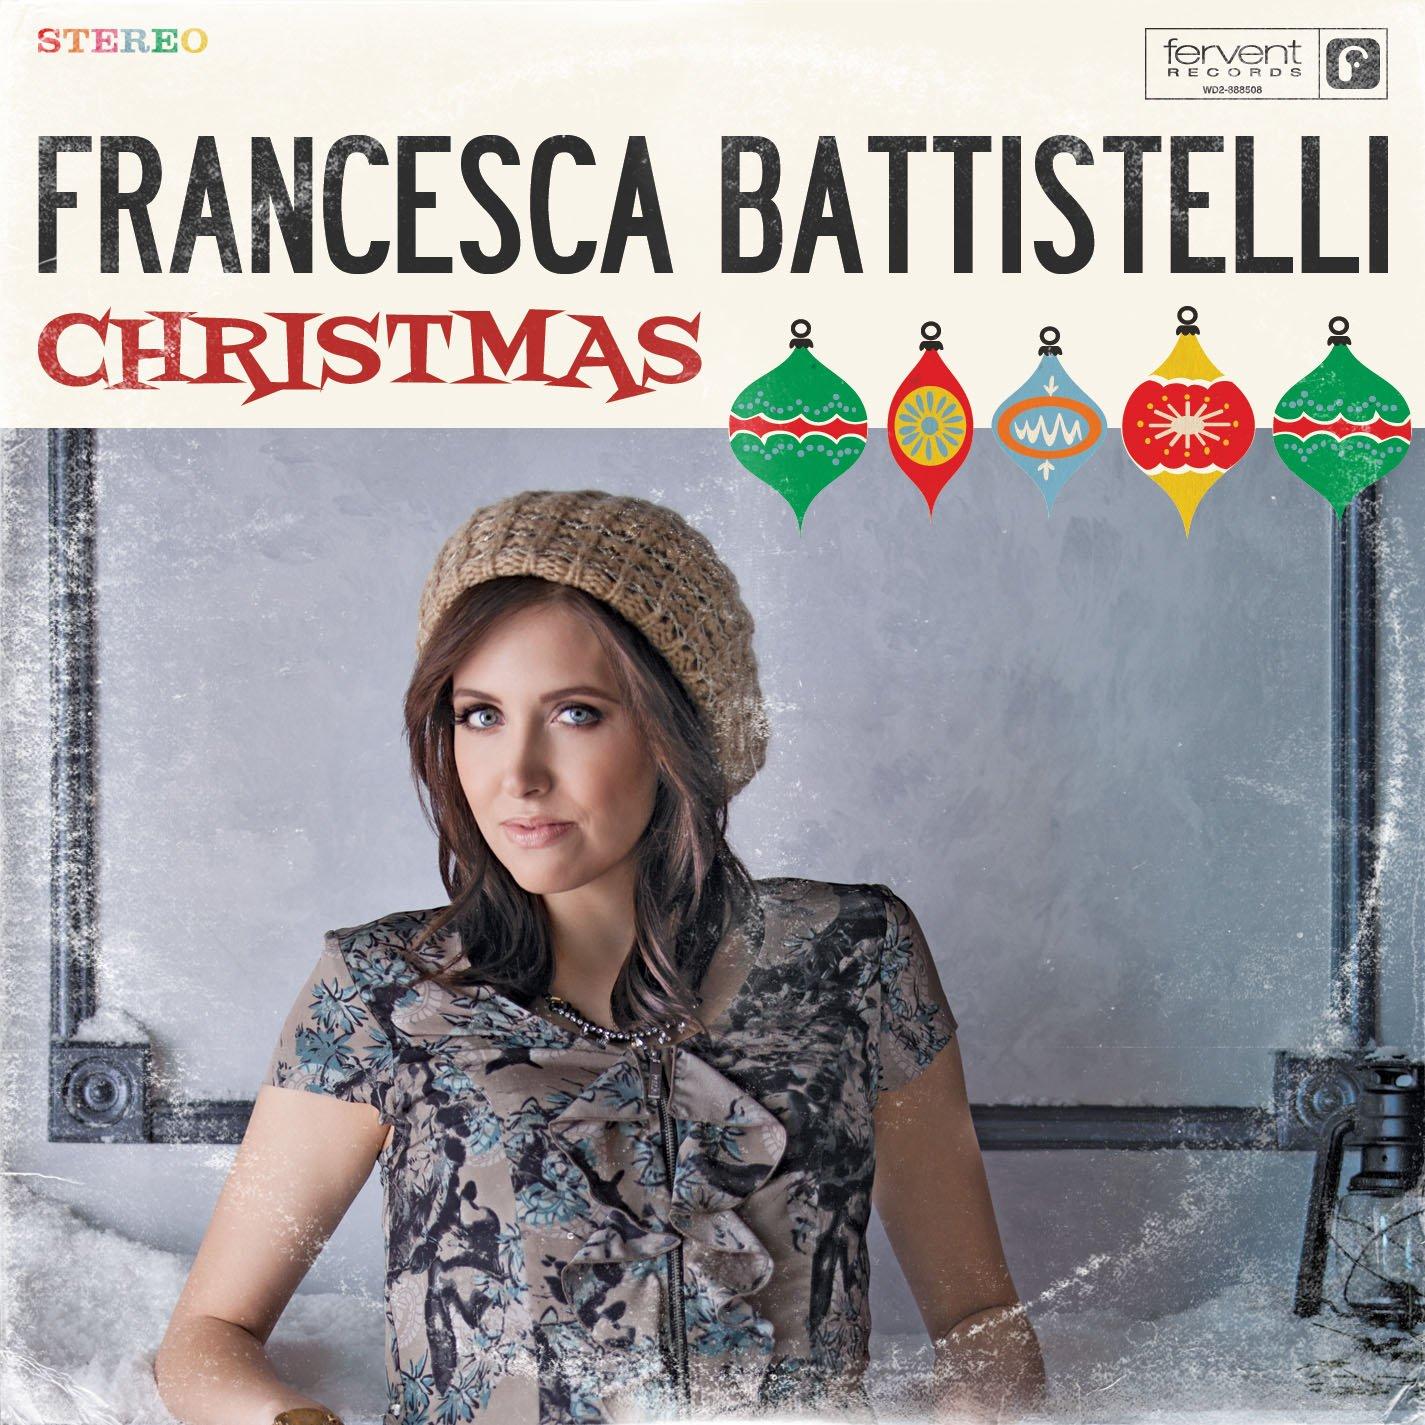 Francesca Battistelli - Christmas - Amazon.com Music